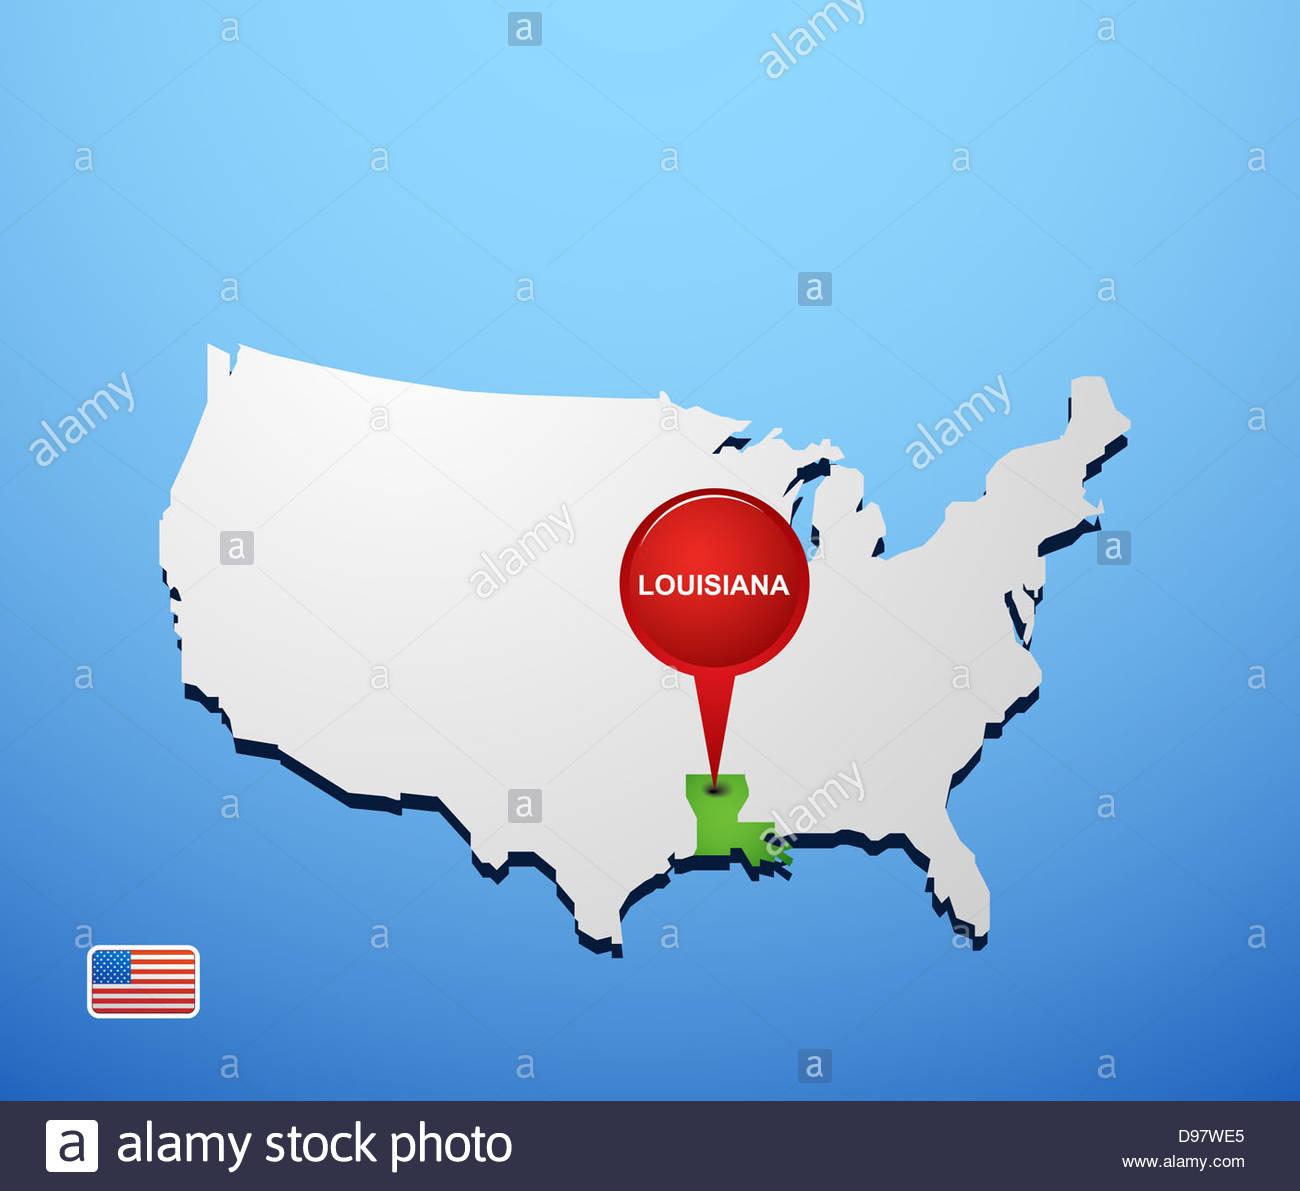 Louisiana On Usa Map Stock Photo 57336669 Alamy